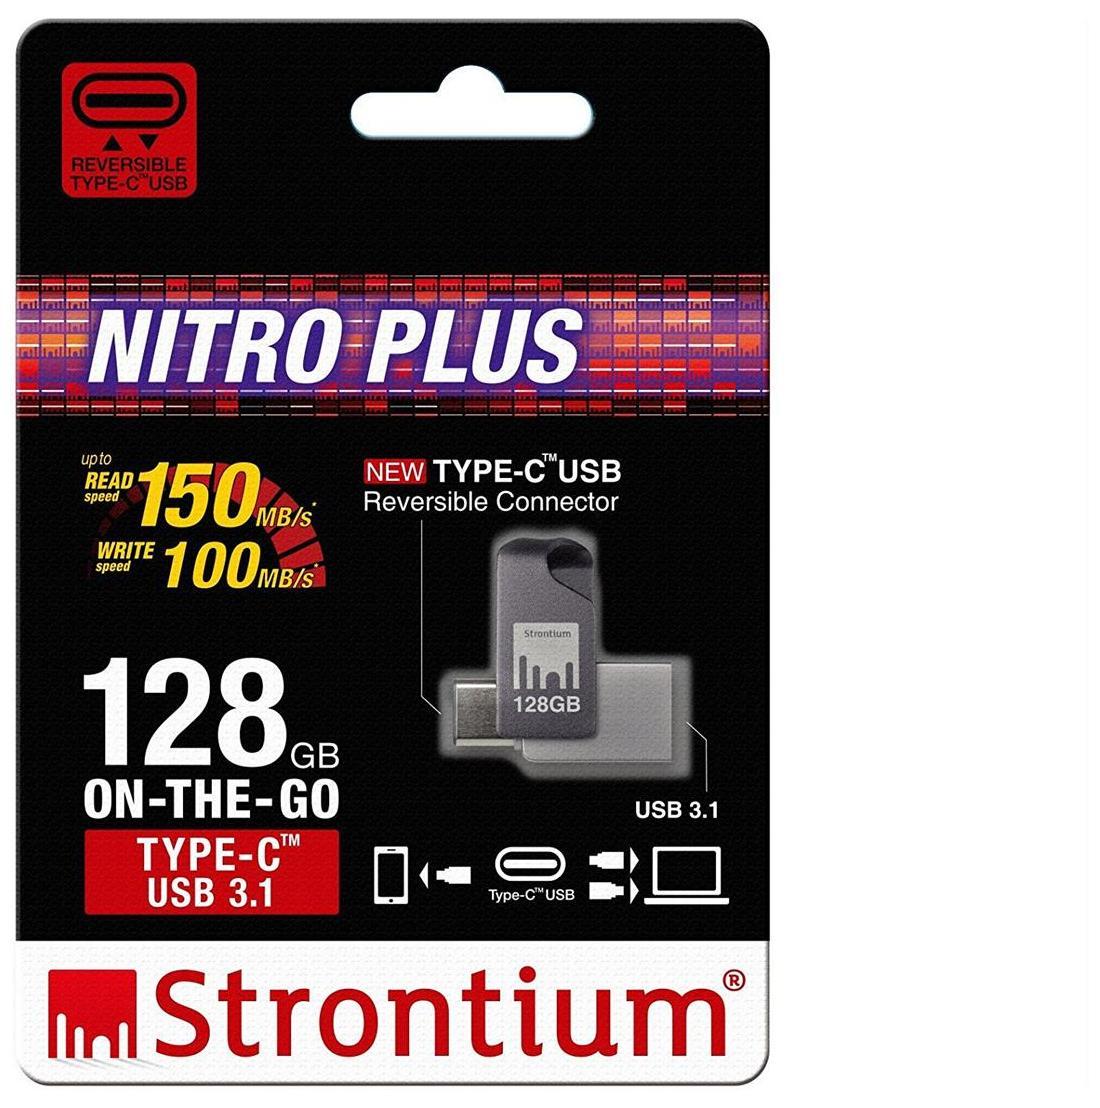 Strontium Nitro Plus USB 3.0 128GB Pen Drive (Silver & Black)